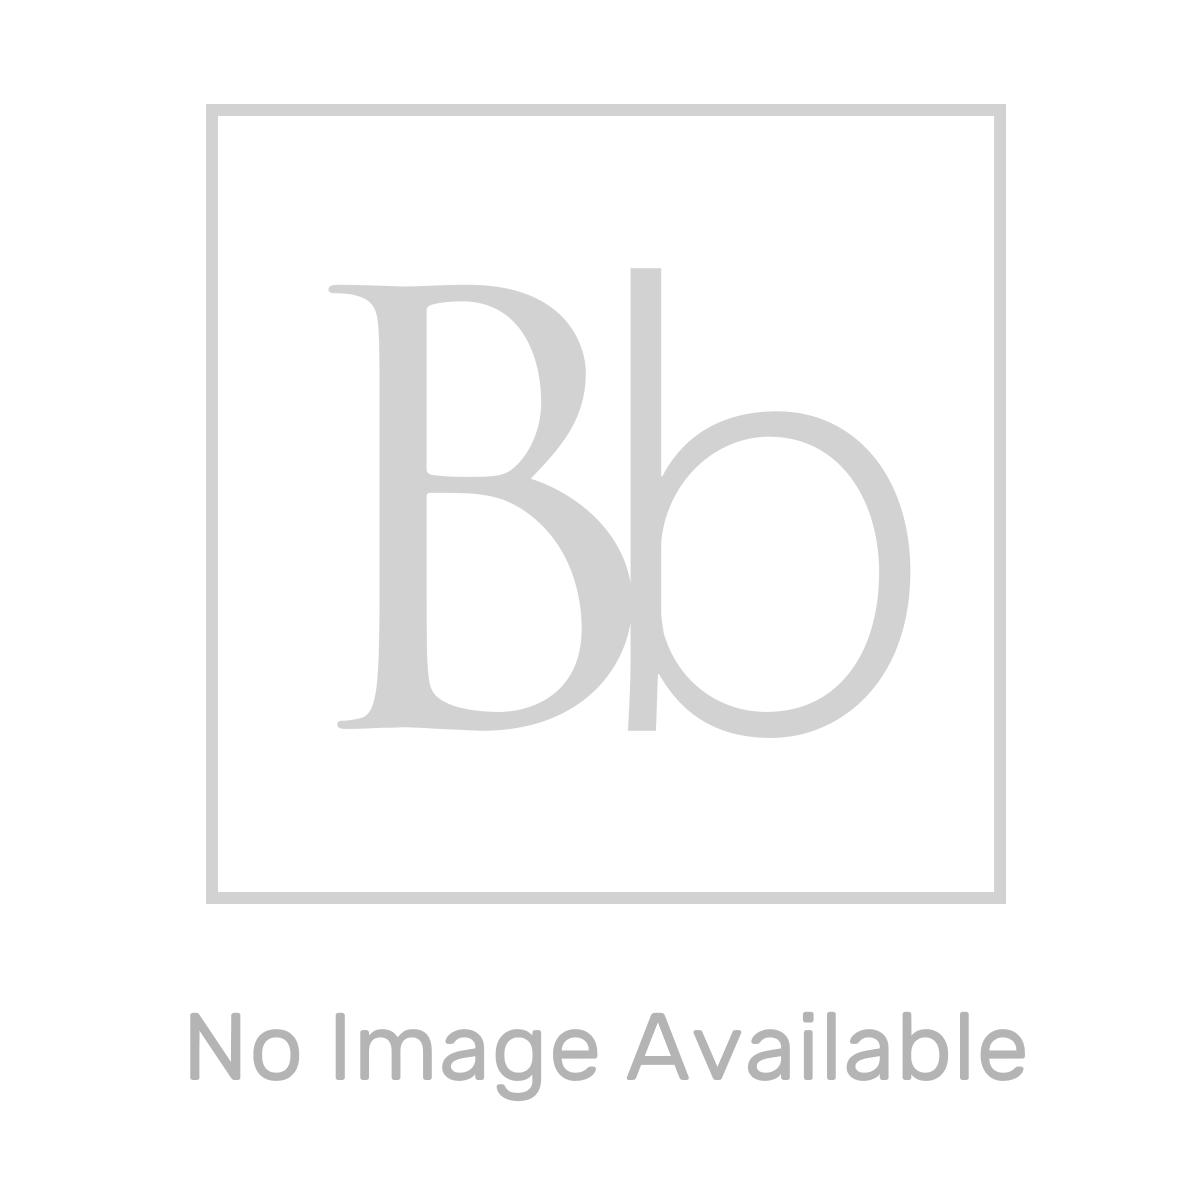 RAK Pluto Heated LED Bluetooth Mirror 600 x 800 Line Drawing